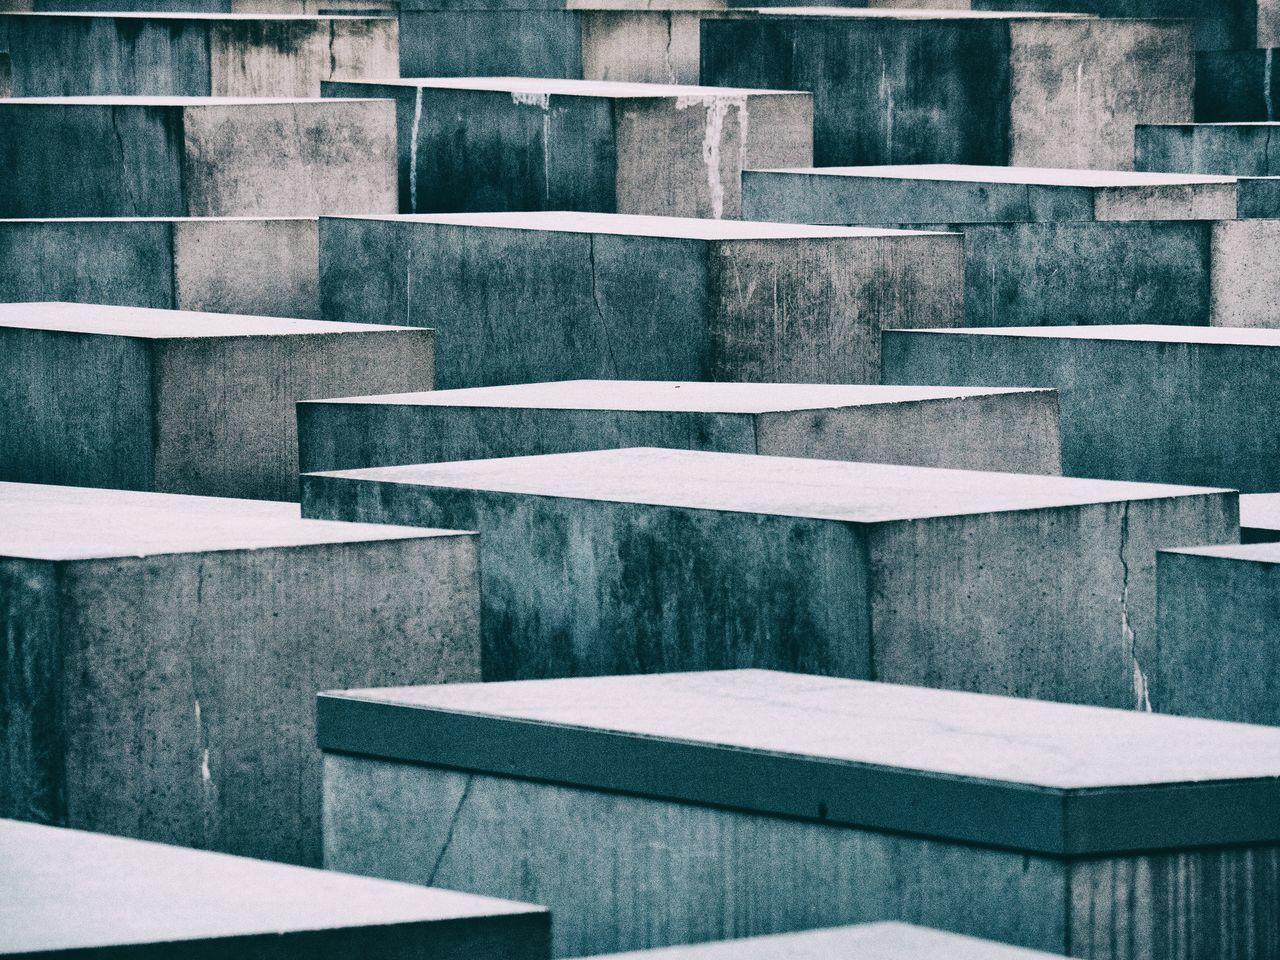 Abstract Architecture Berlin Blocks Concrete Cracks Holocaust Holocaust Memorial Lines Memorial No People Stele Stelenfeld Stone Texture